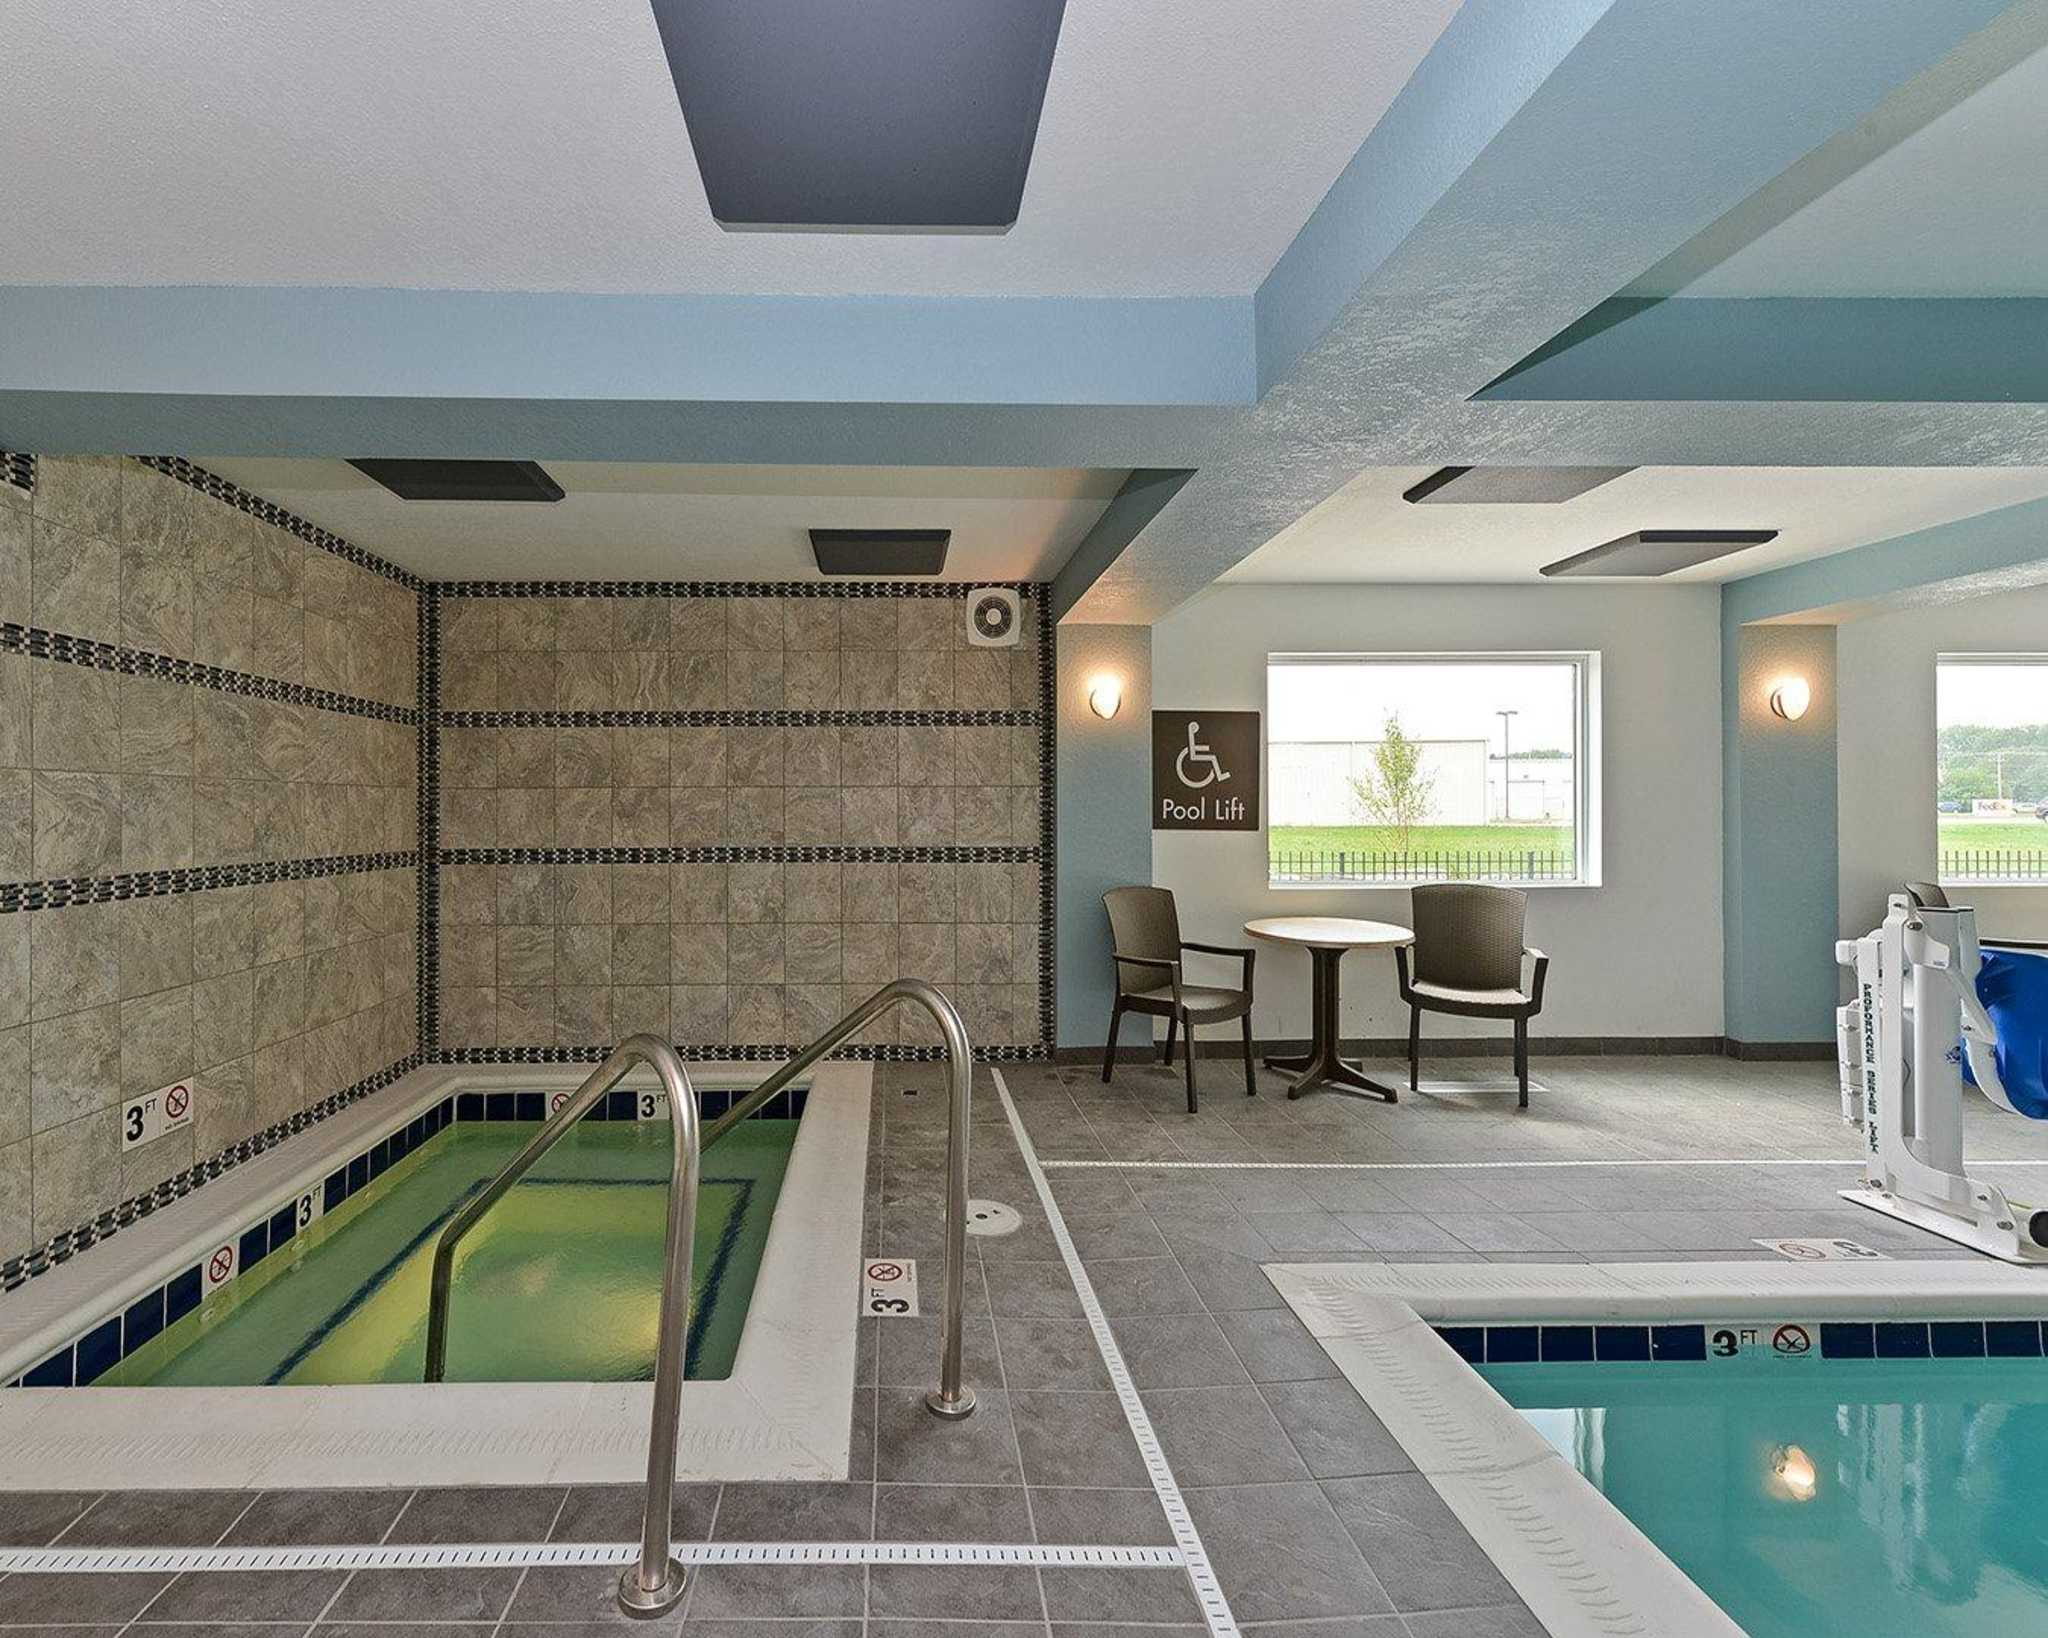 Comfort Inn Amp Suites Springfield Illinois Il